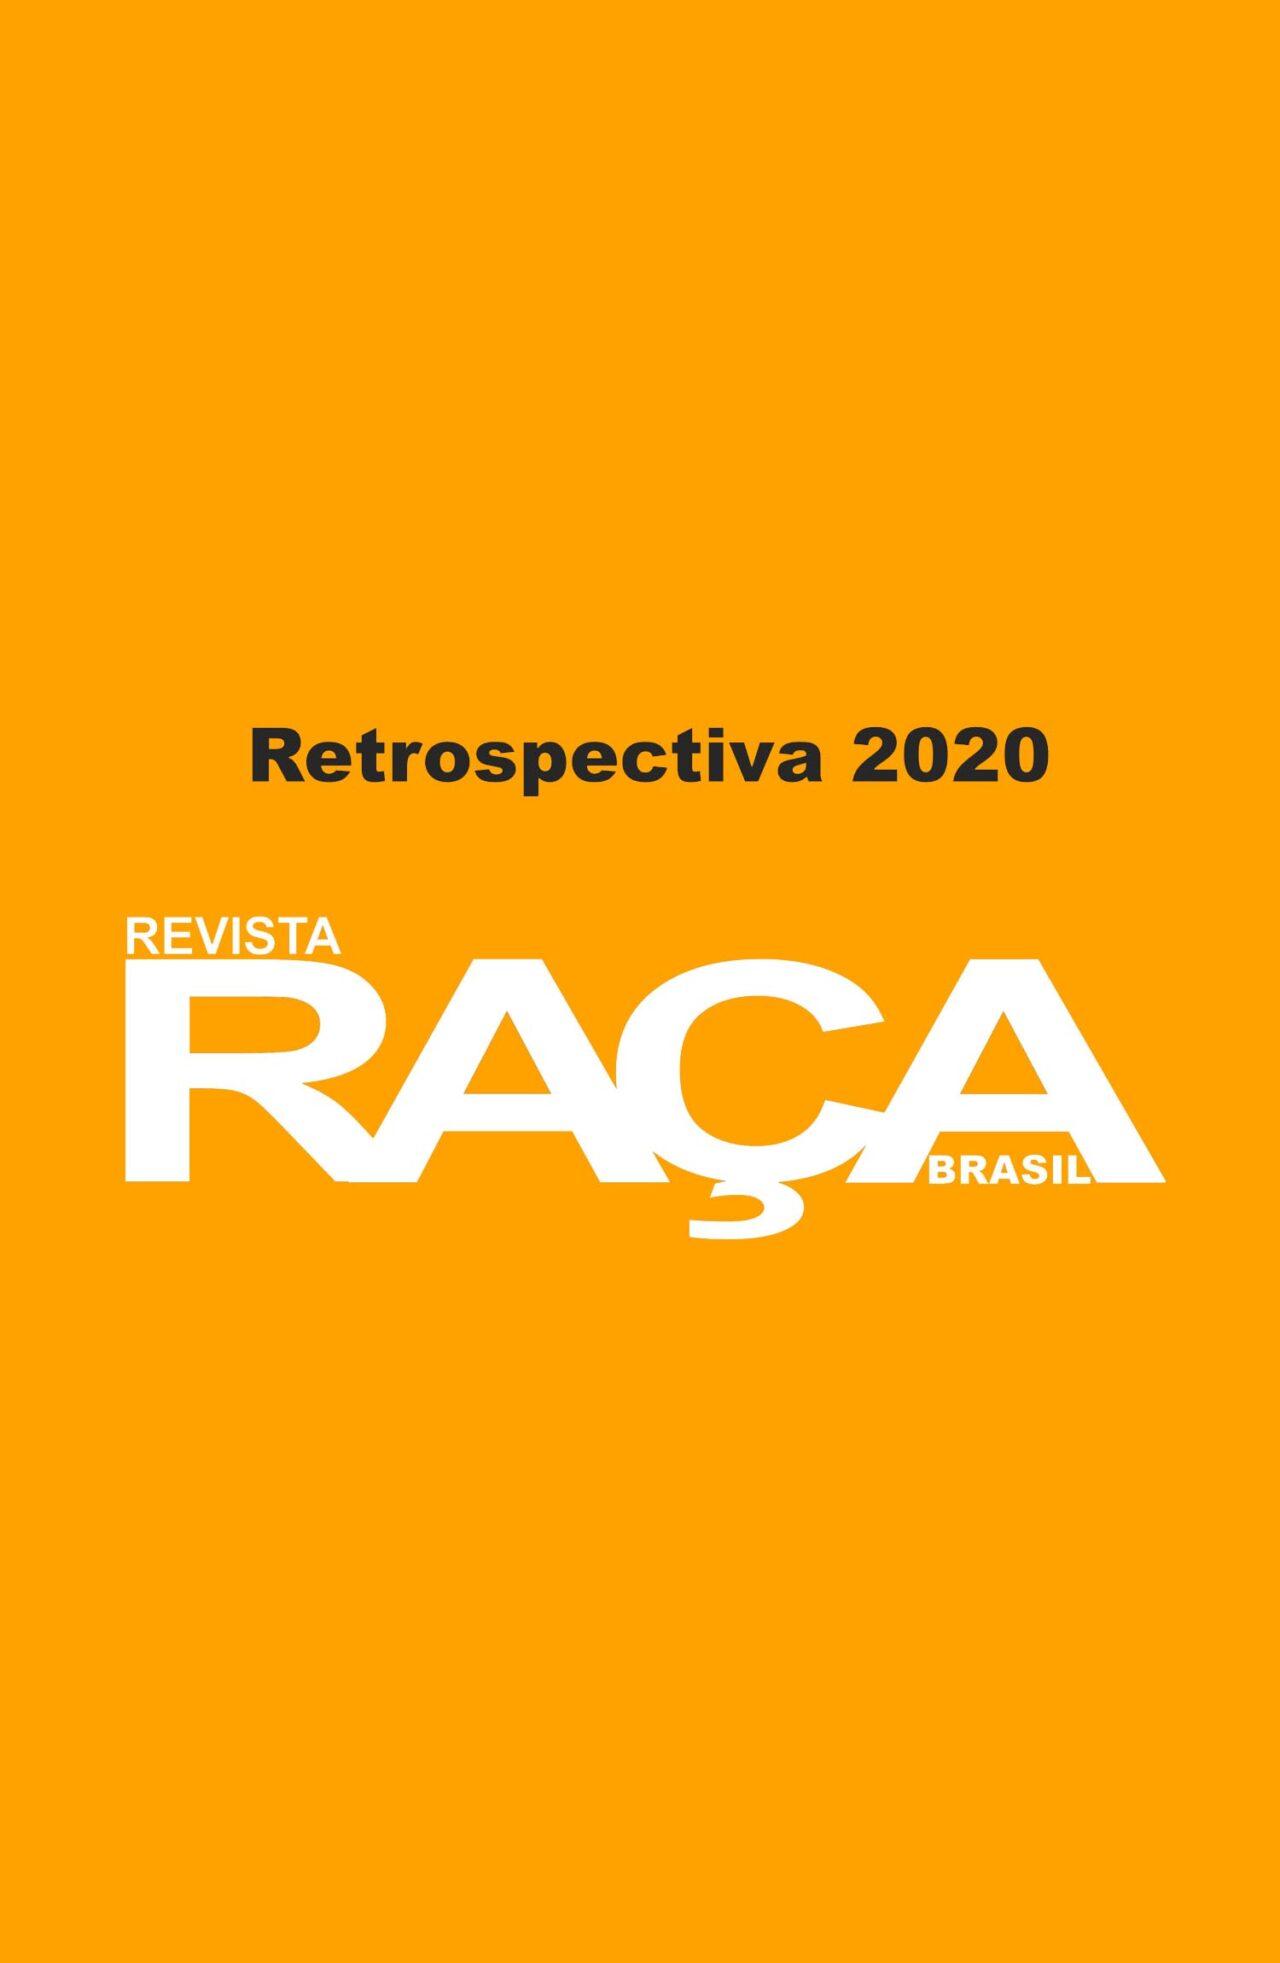 https://revistaraca.com.br/wp-content/uploads/2020/12/001-1280x1963.jpg